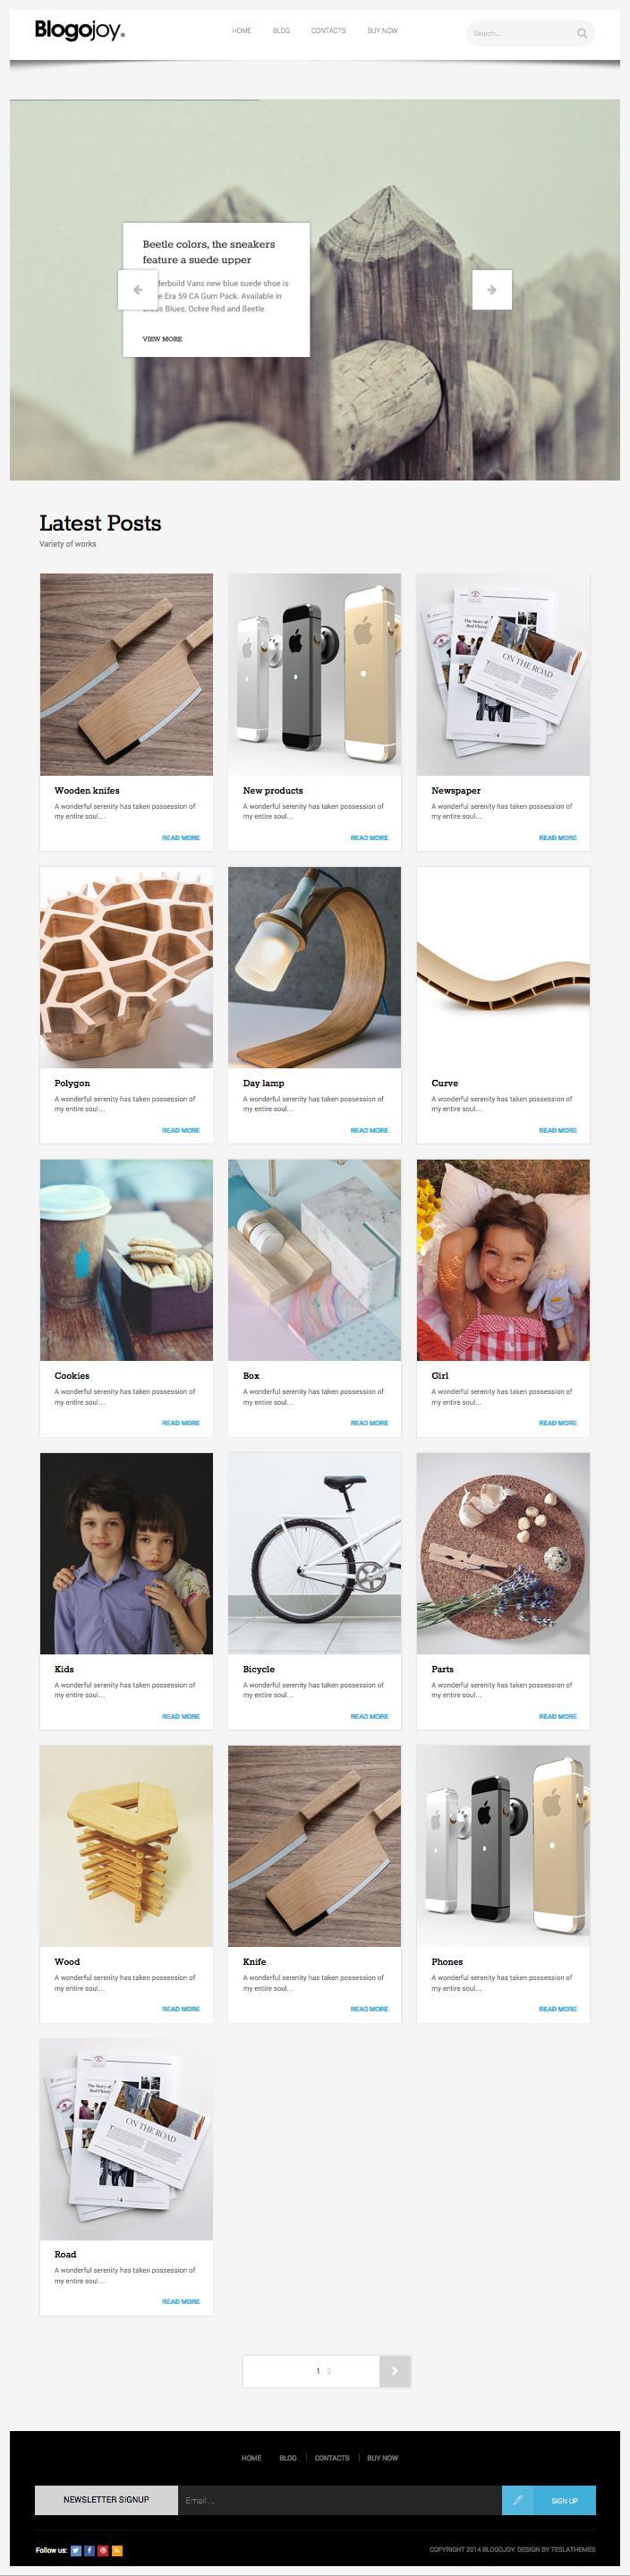 Blogojoy WordPress Minimalist Blog Theme